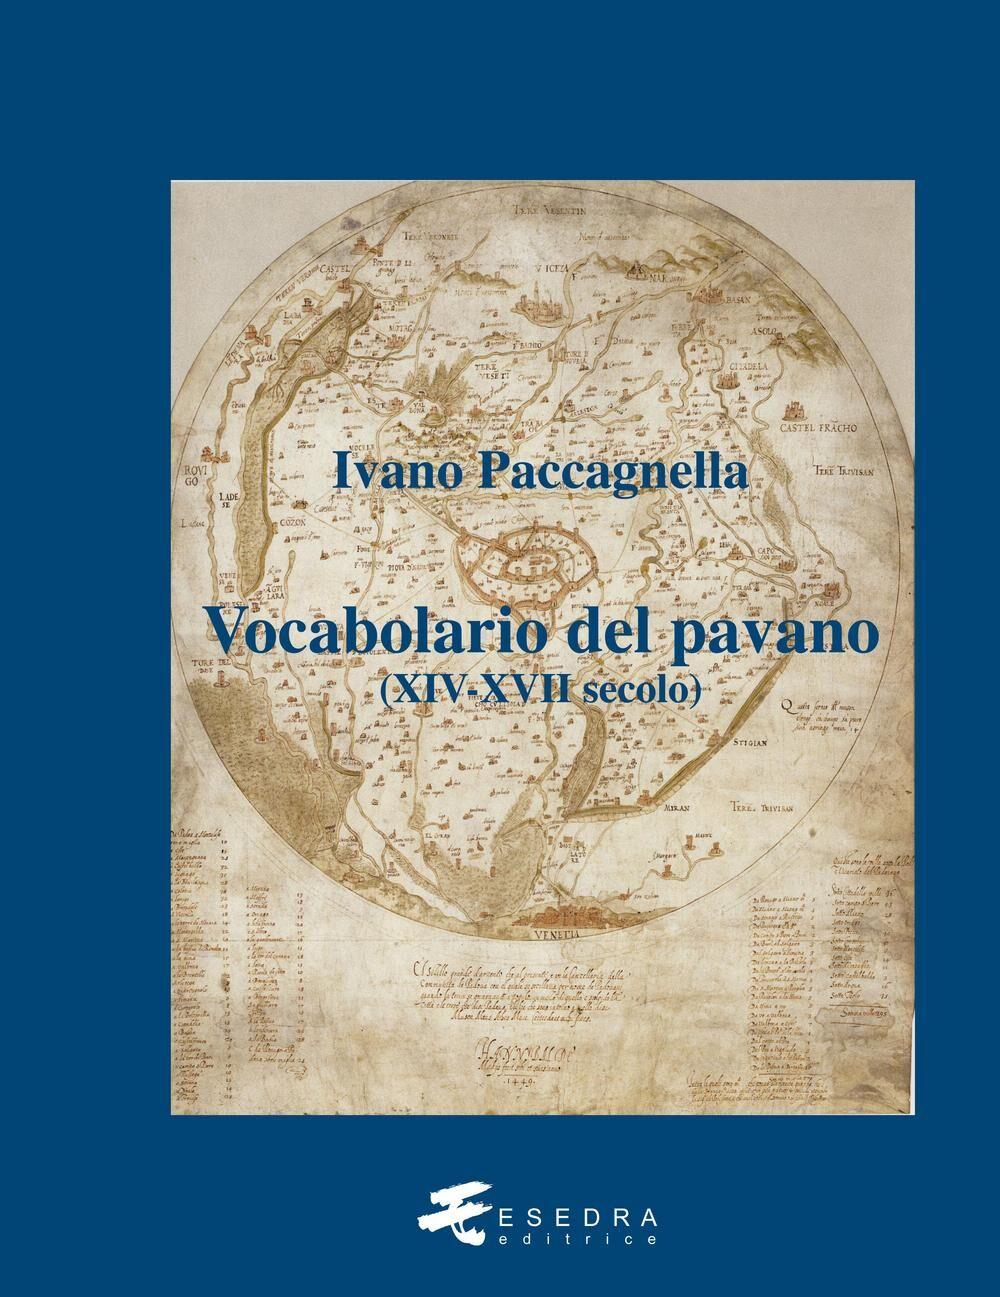 Vocabolario del pavano (XIV-XVII secolo)